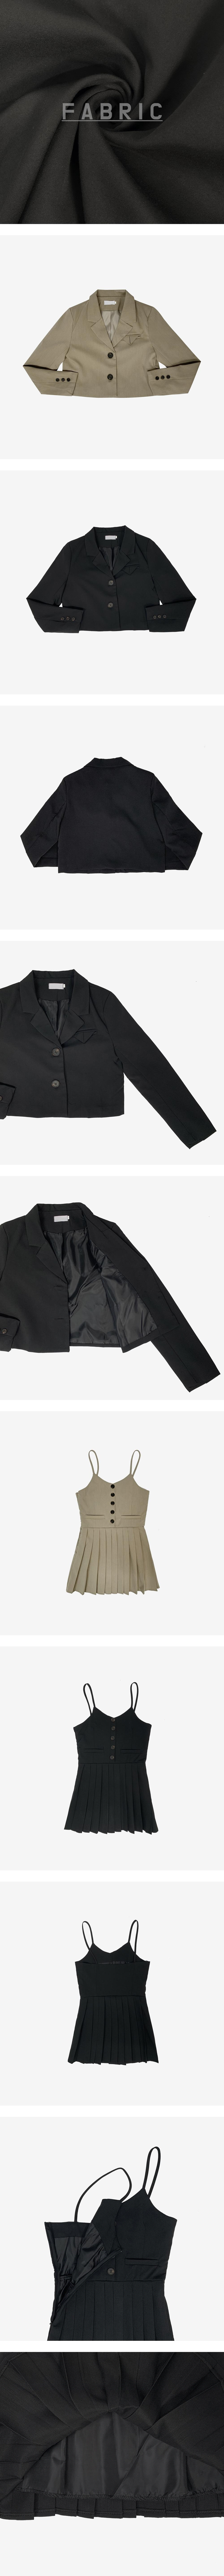 Falling cropped jacket two-piece set